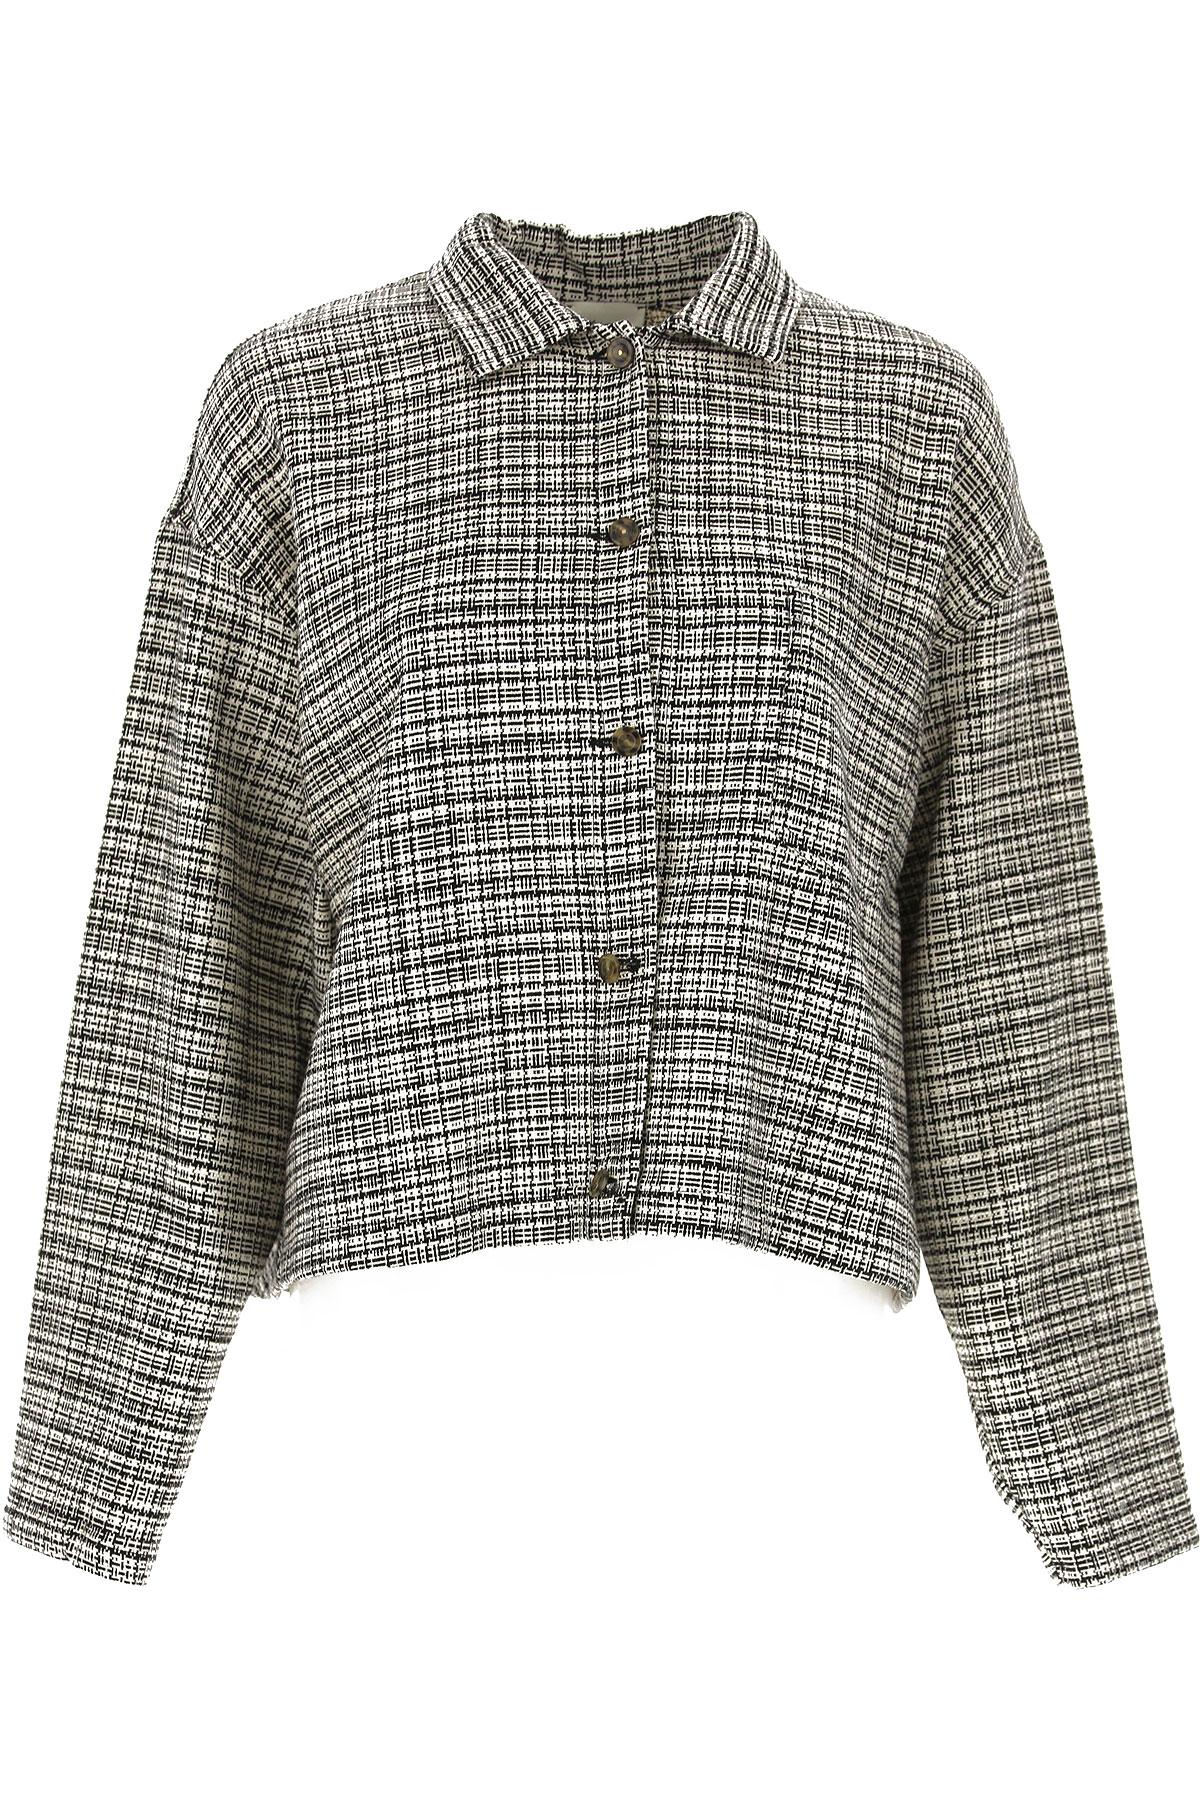 ALYSI Jacket for Women On Sale, Black, Virgin wool, 2019, 4 6 8